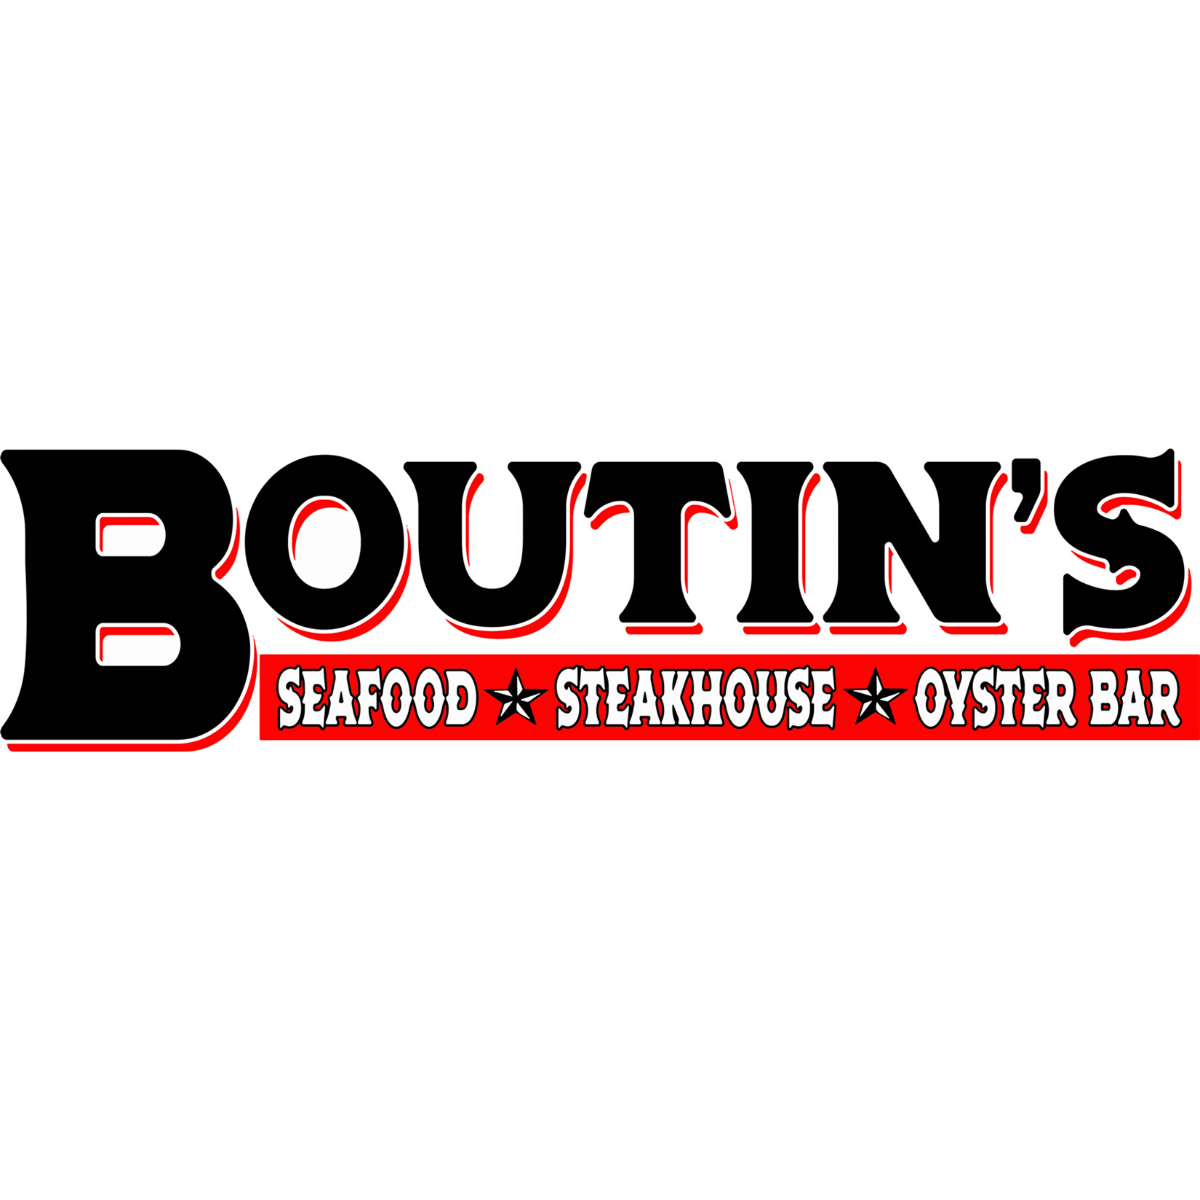 Boutin's Cajun Seafood Steakhouse & Oyster Bar